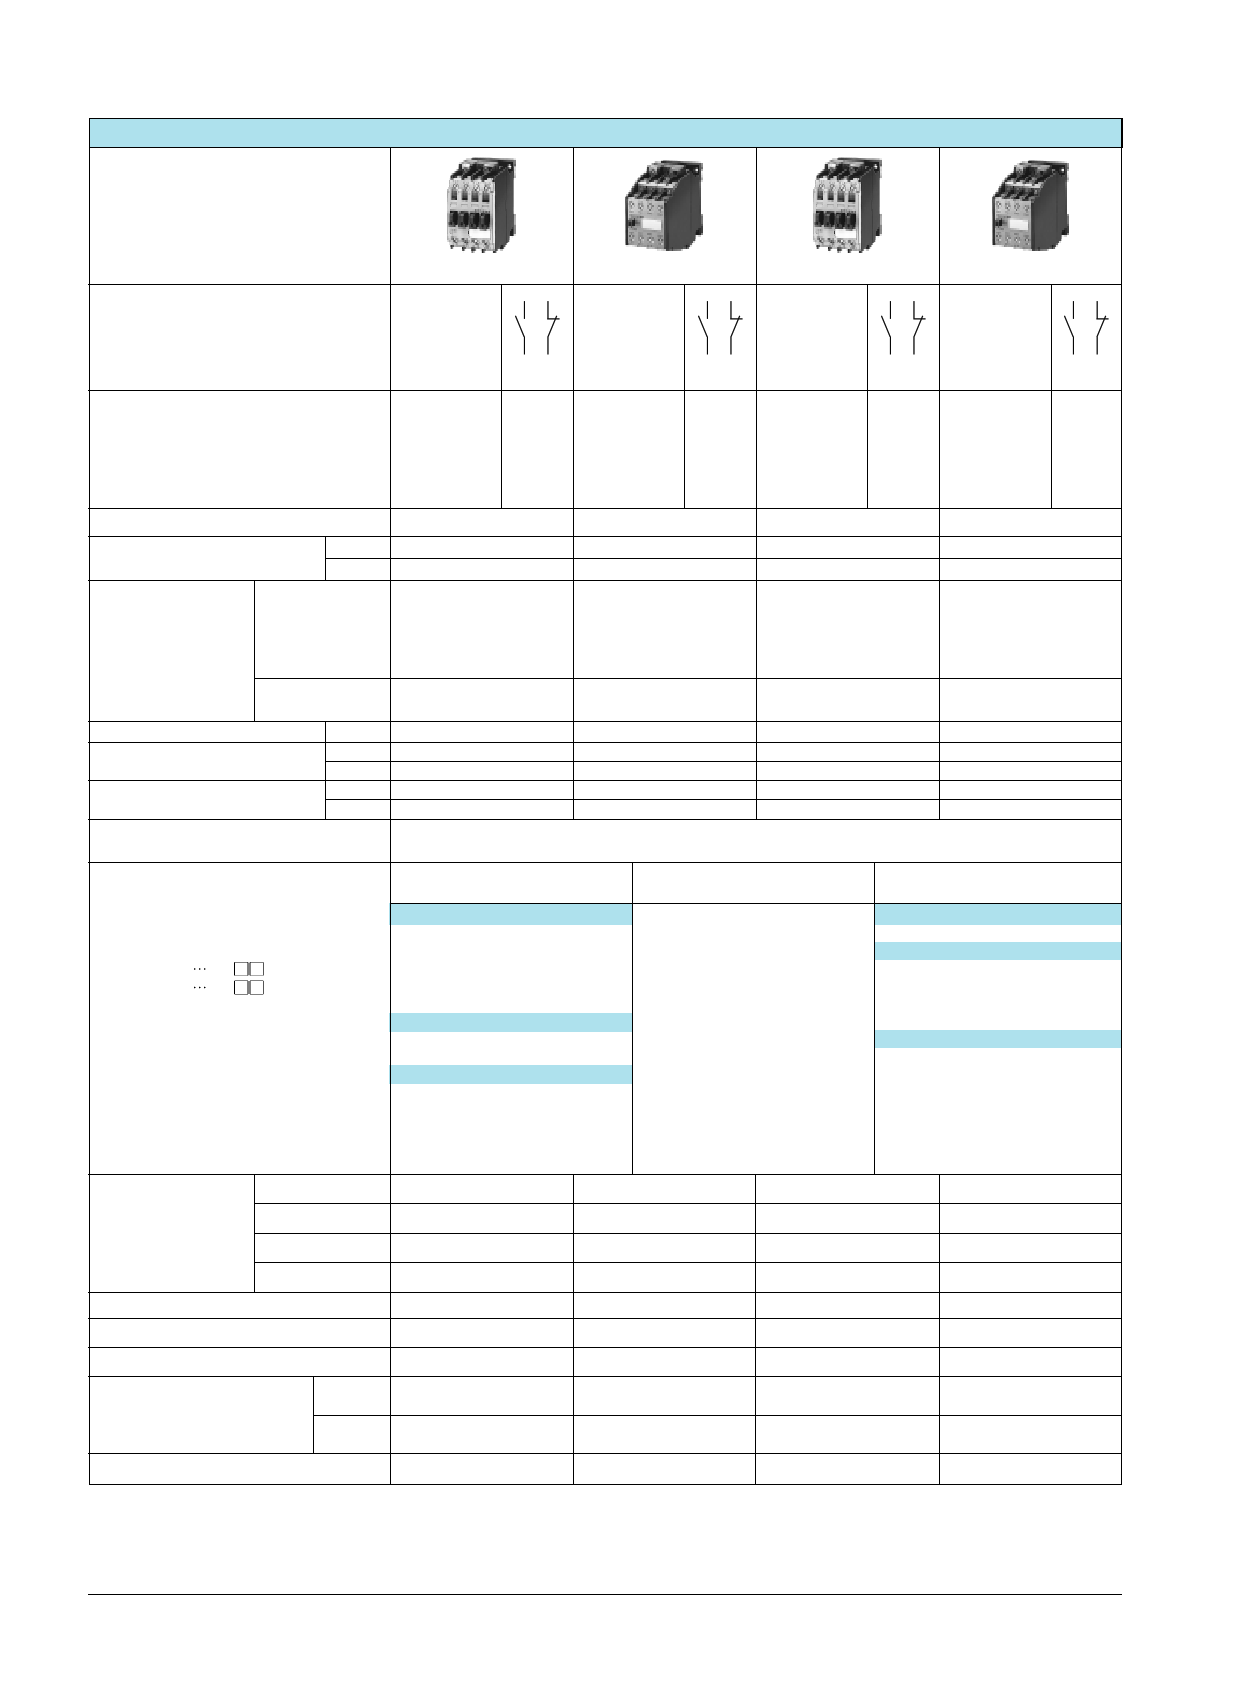 3TF44 Datasheet, 3TF44 PDF,ピン配置, 機能